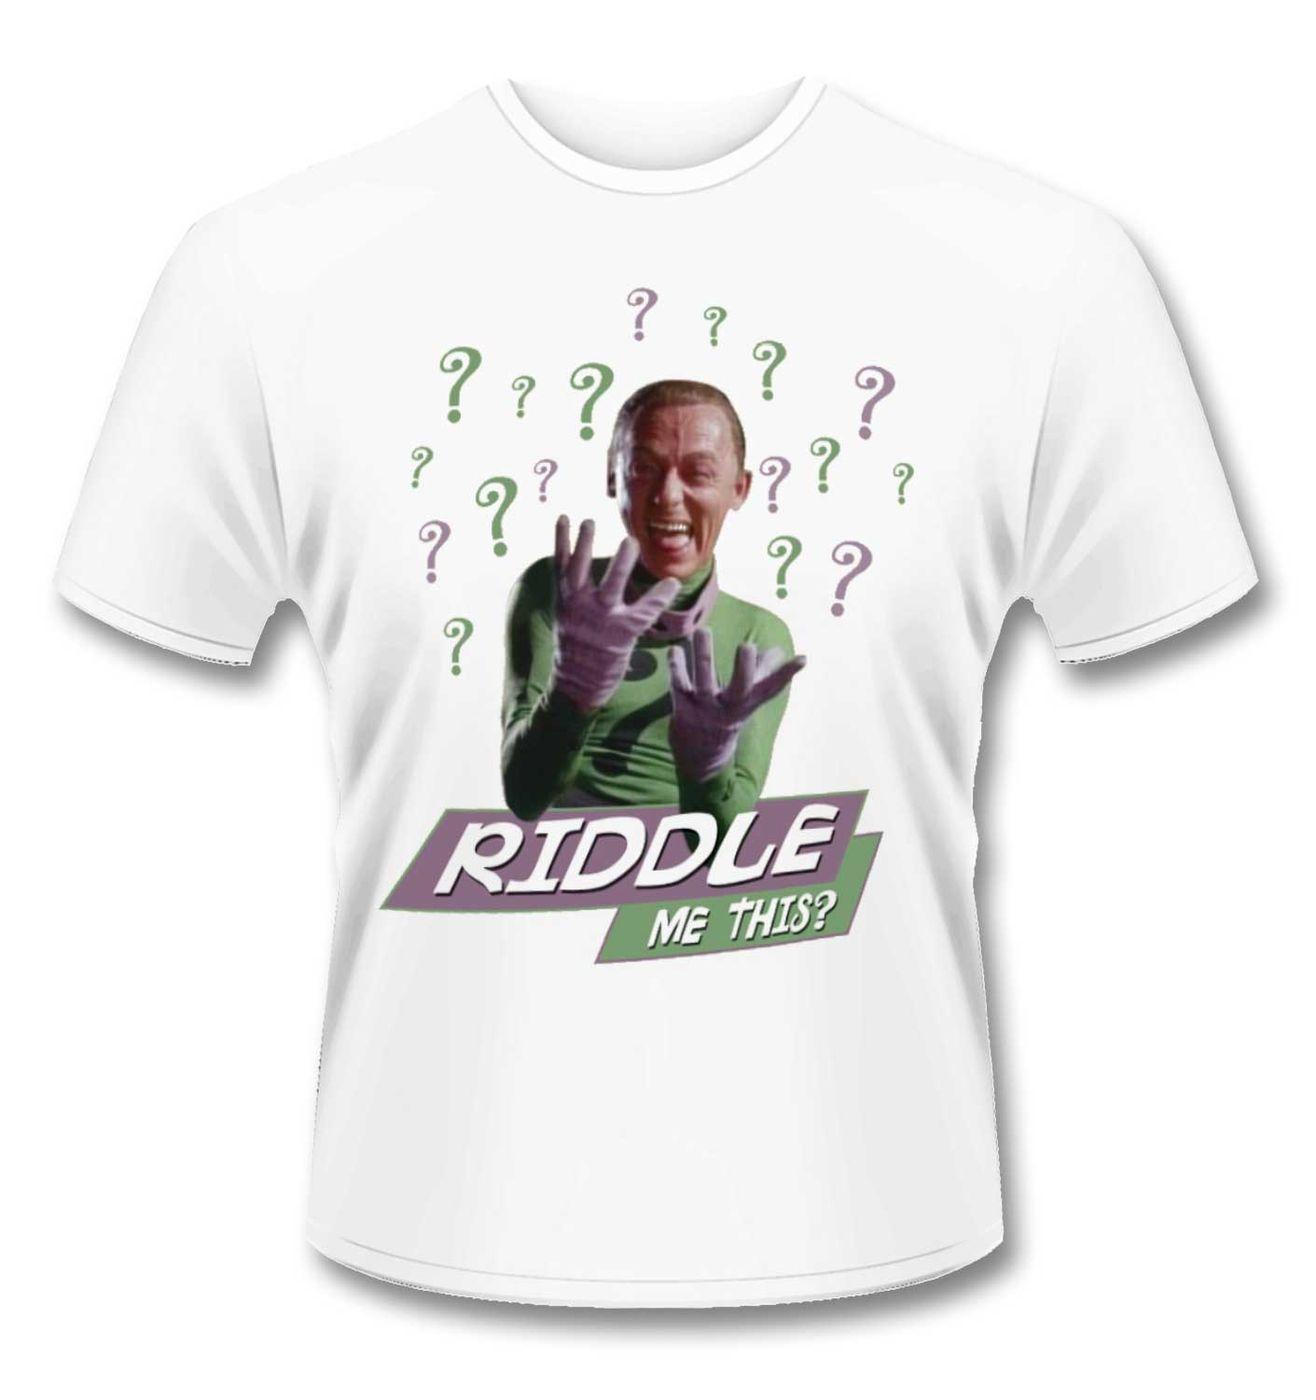 Batman Riddler Riddle Me This t-shirt - Official DC Originals